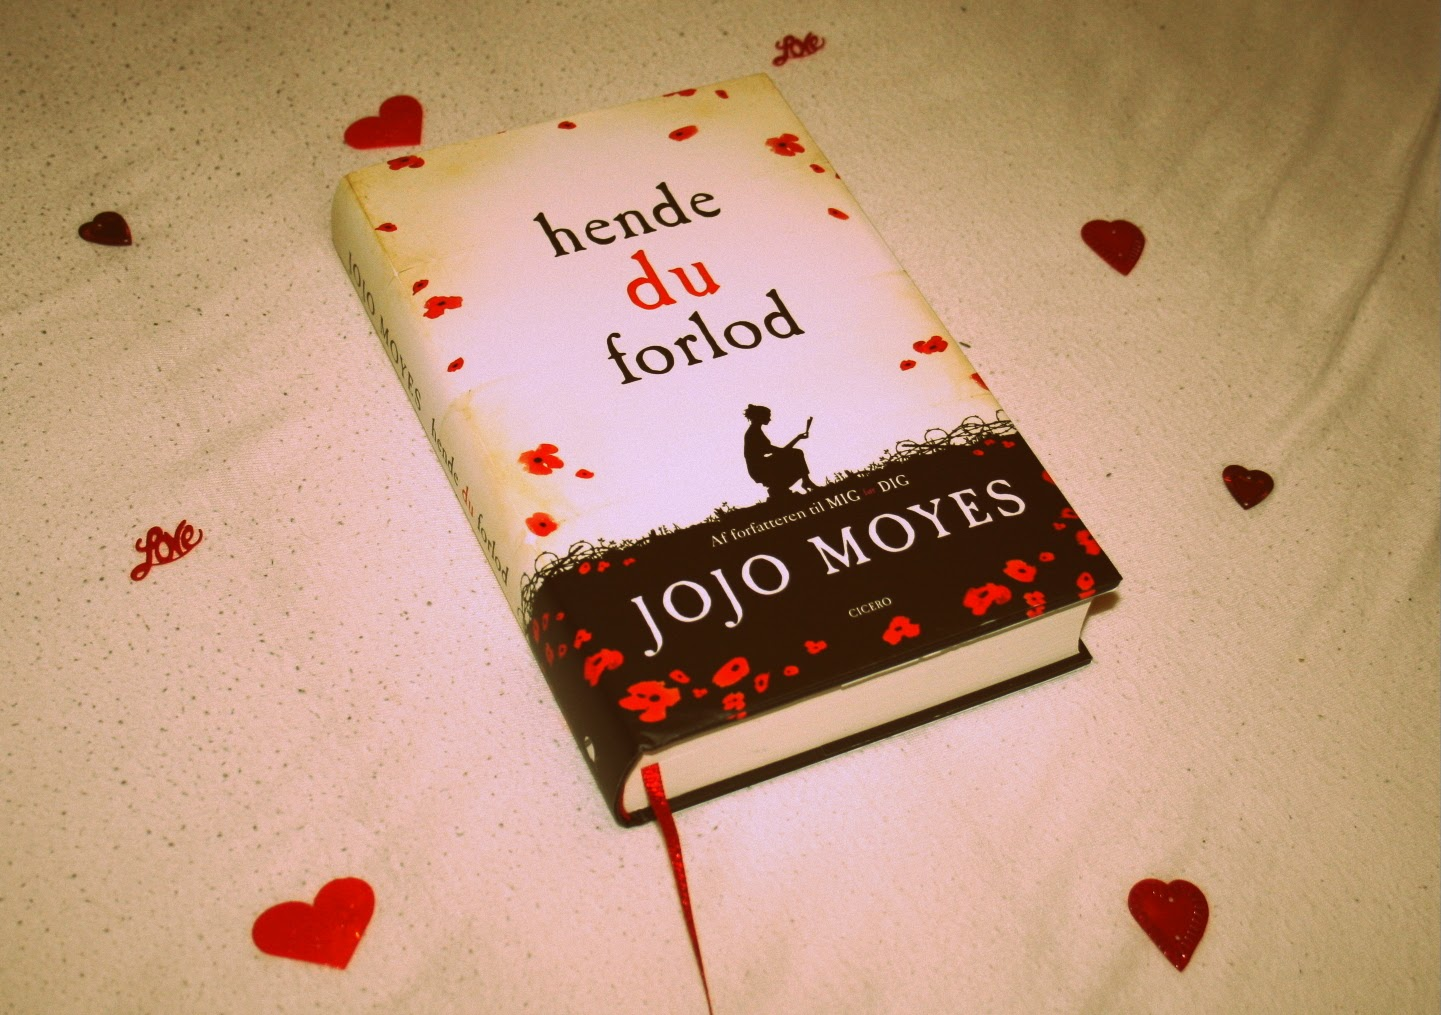 Hende du forlod af Jojo Moyes